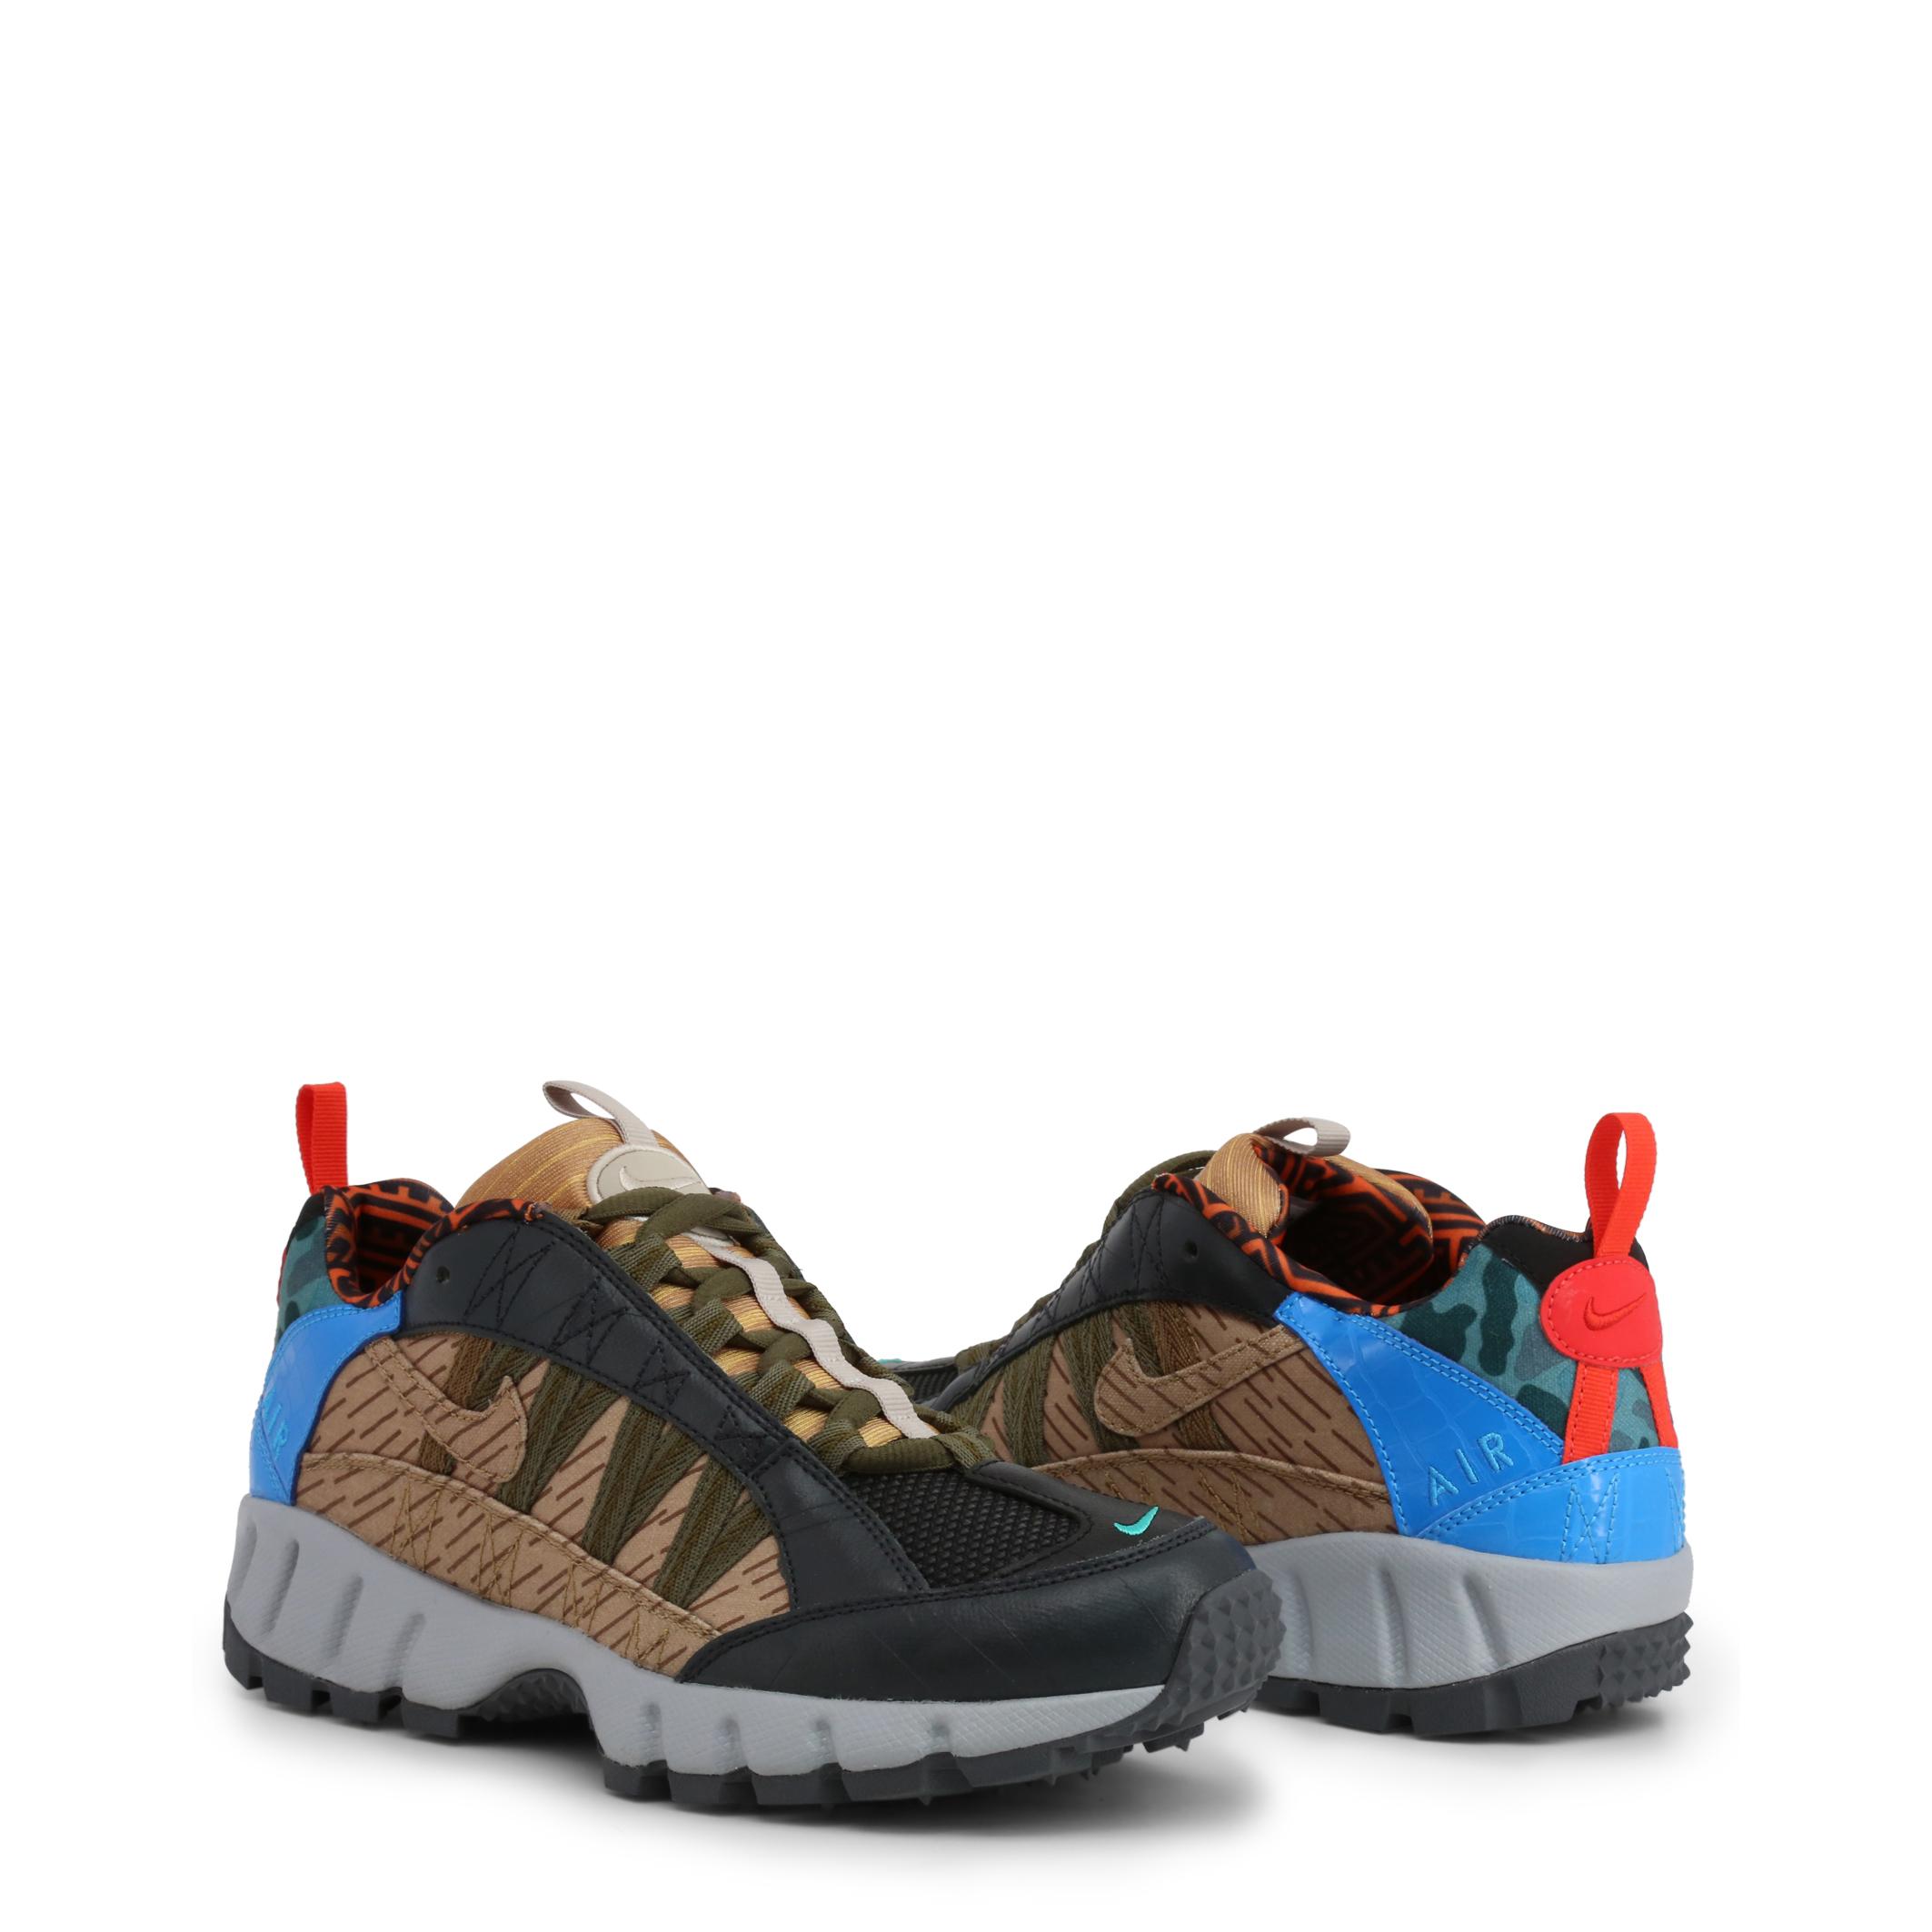 103703-643120-Nike-Air-Humara17Premium-Uomo-Nero-103703 miniatura 2